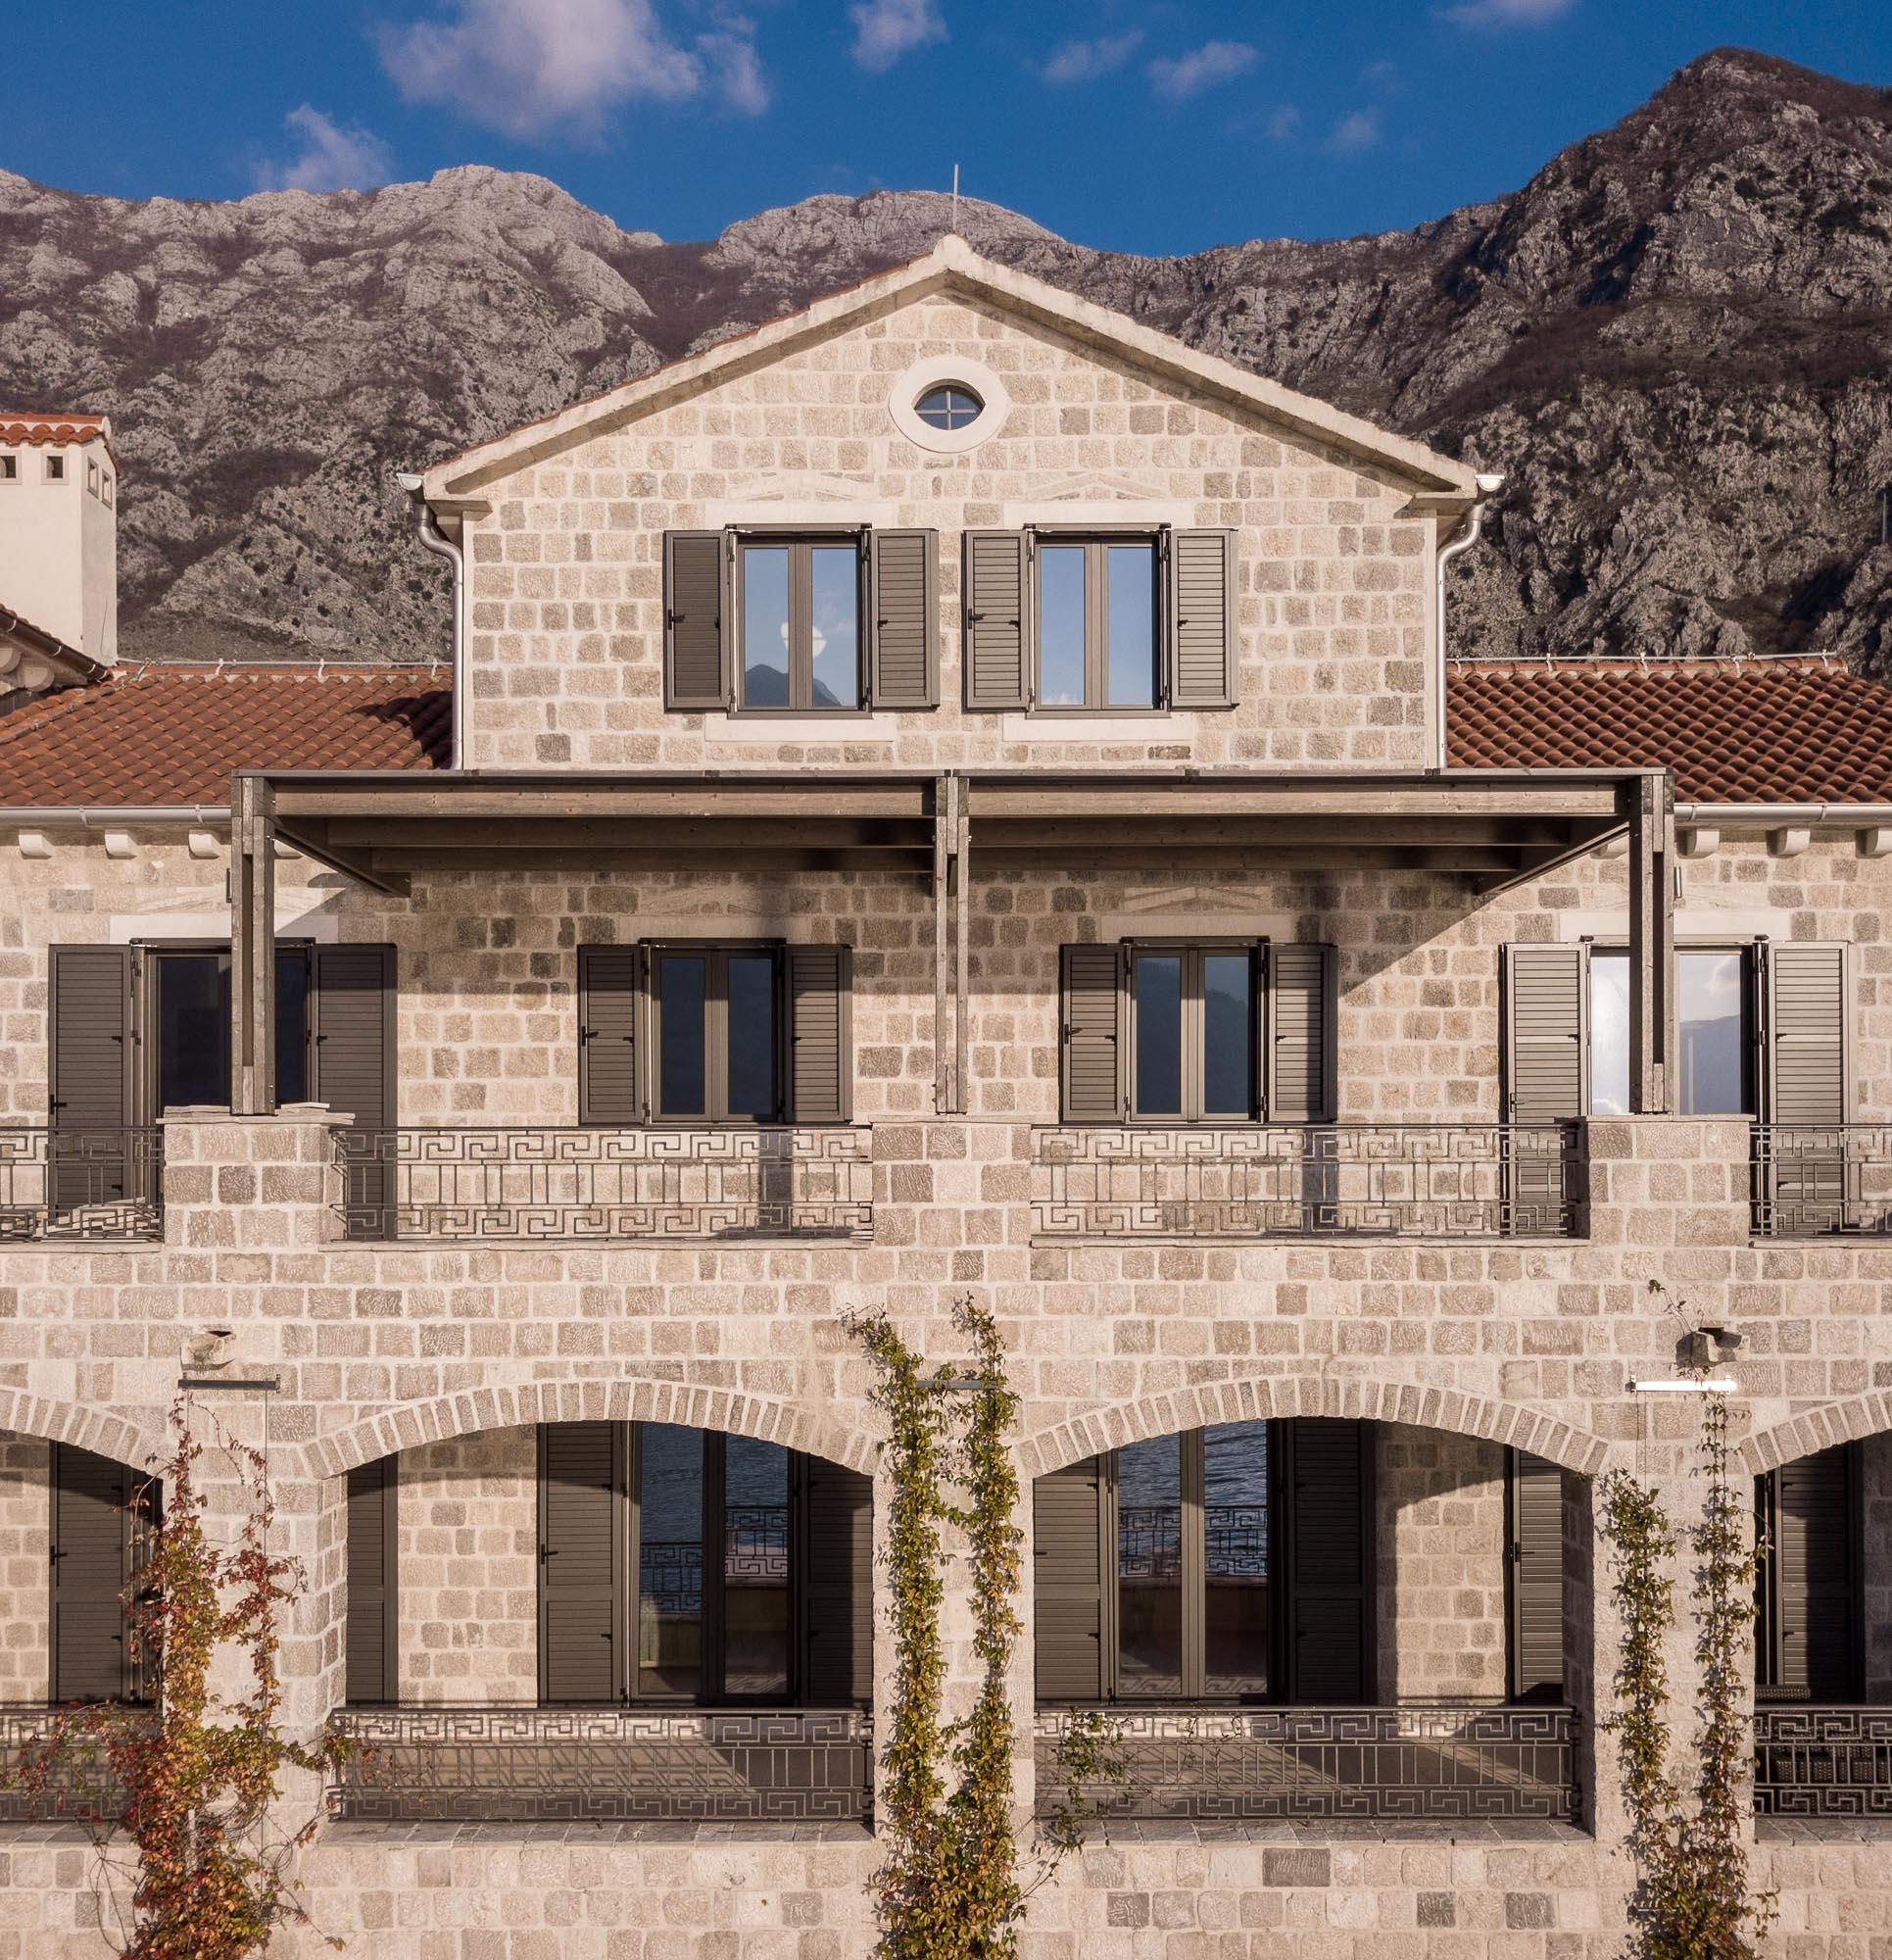 new-windows-facade-of-stone-house-risan-montenegro.JPG